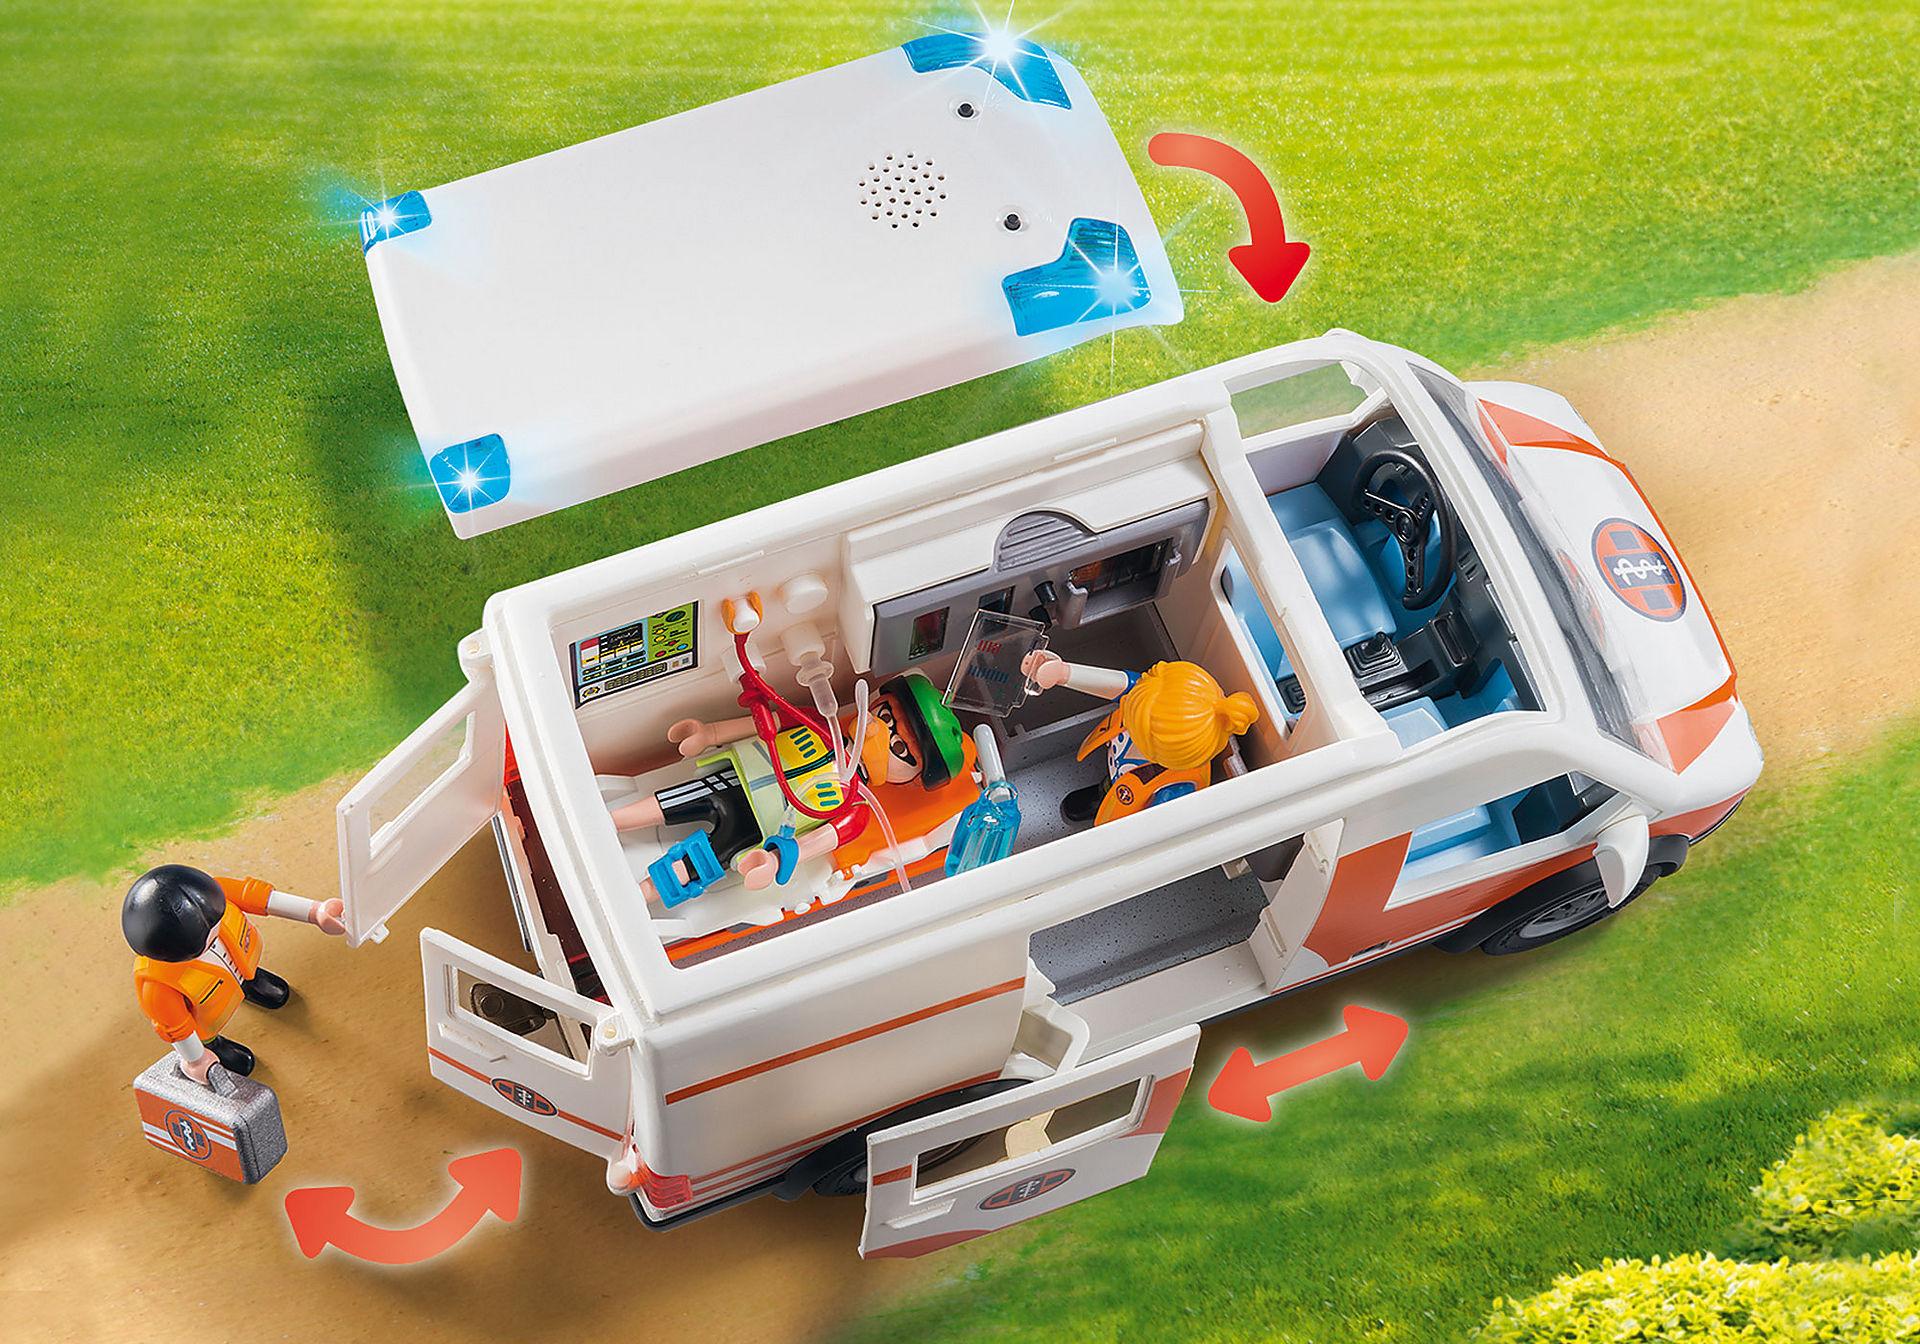 http://media.playmobil.com/i/playmobil/70049_product_extra3/Rettungswagen mit Licht und Sound